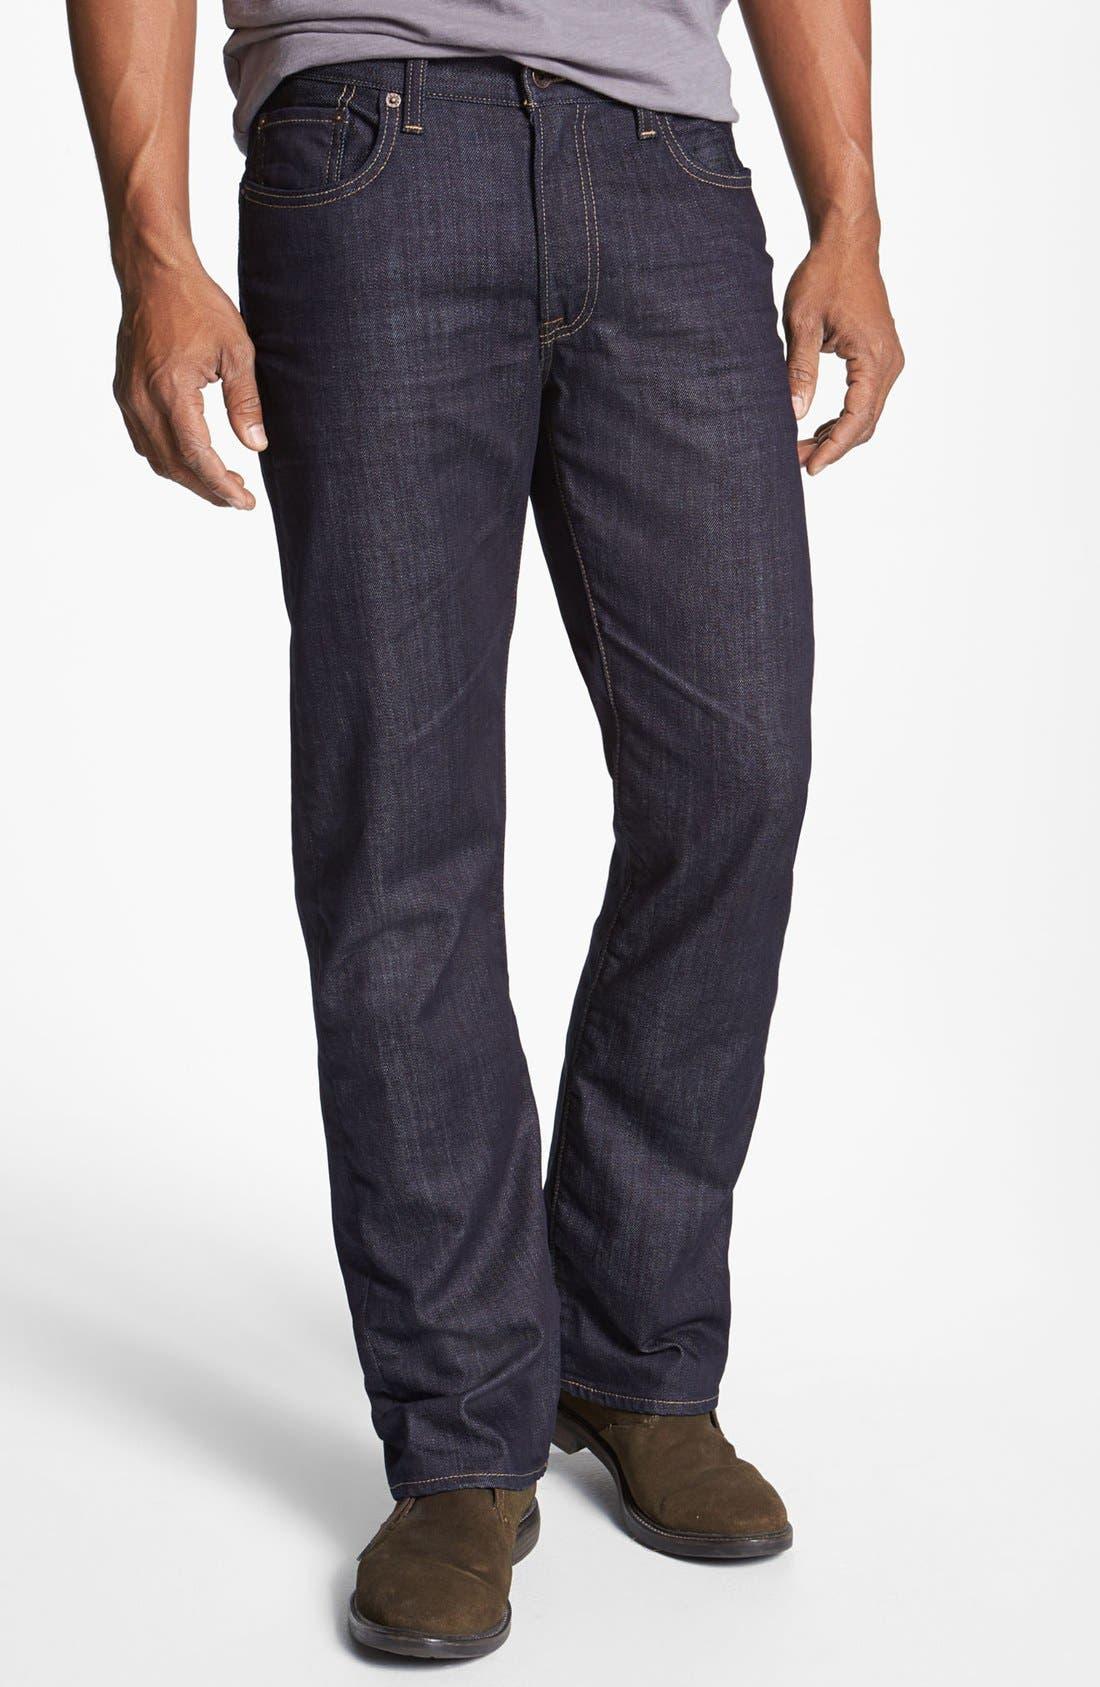 Alternate Image 1 Selected - Lucky Brand '361 Vintage' Straight Leg Jeans (Kino)